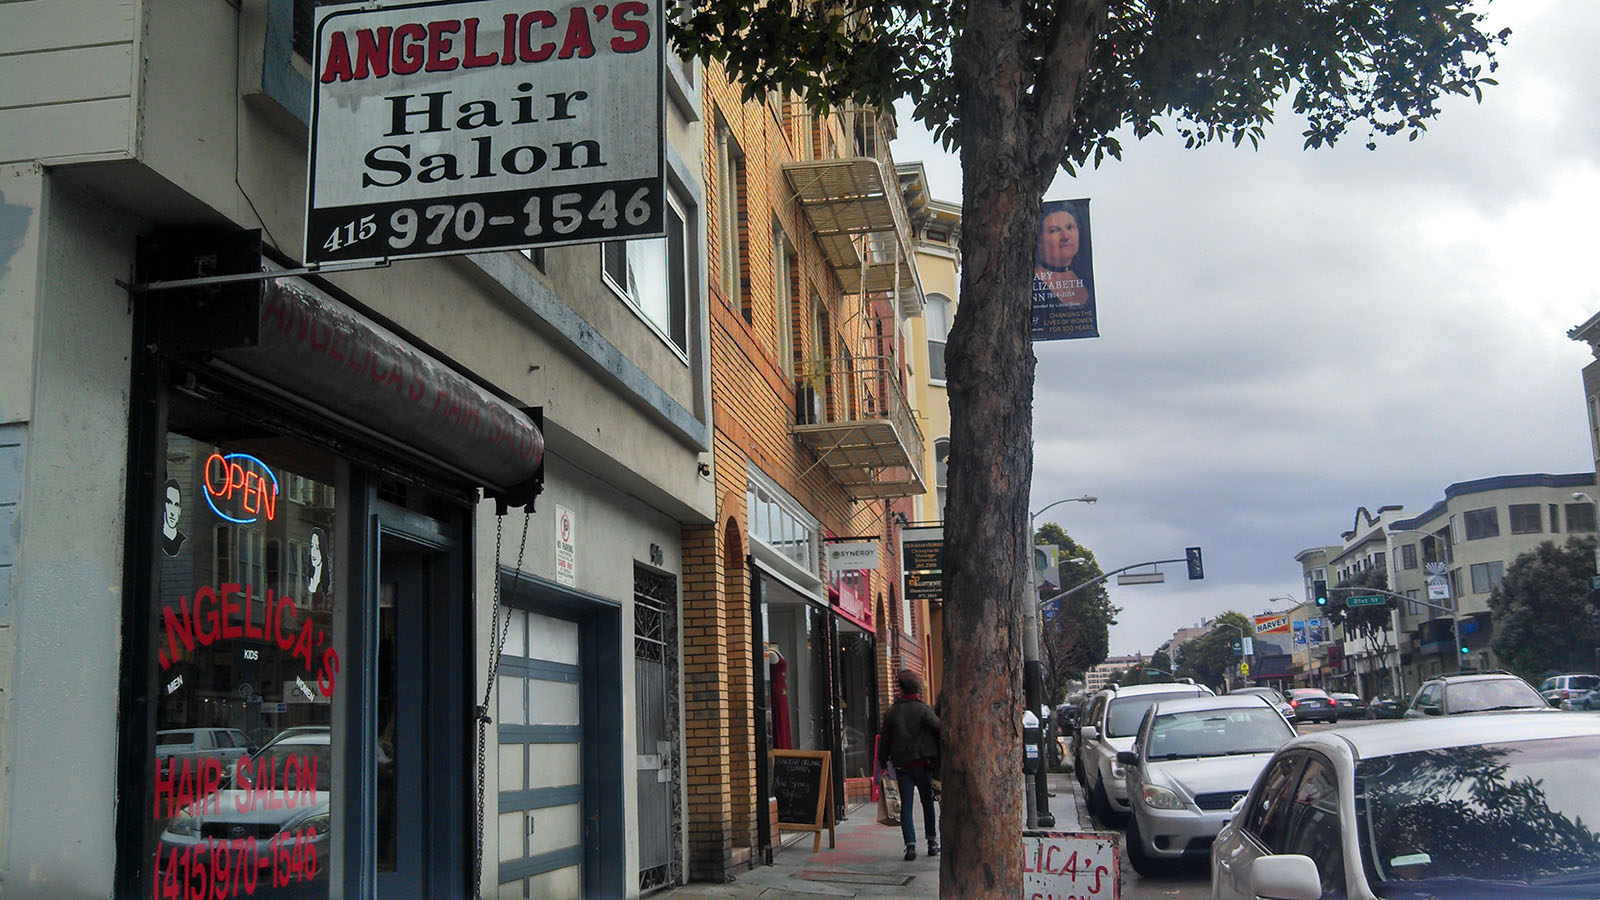 Saturdays at Angelica's Hair Salon